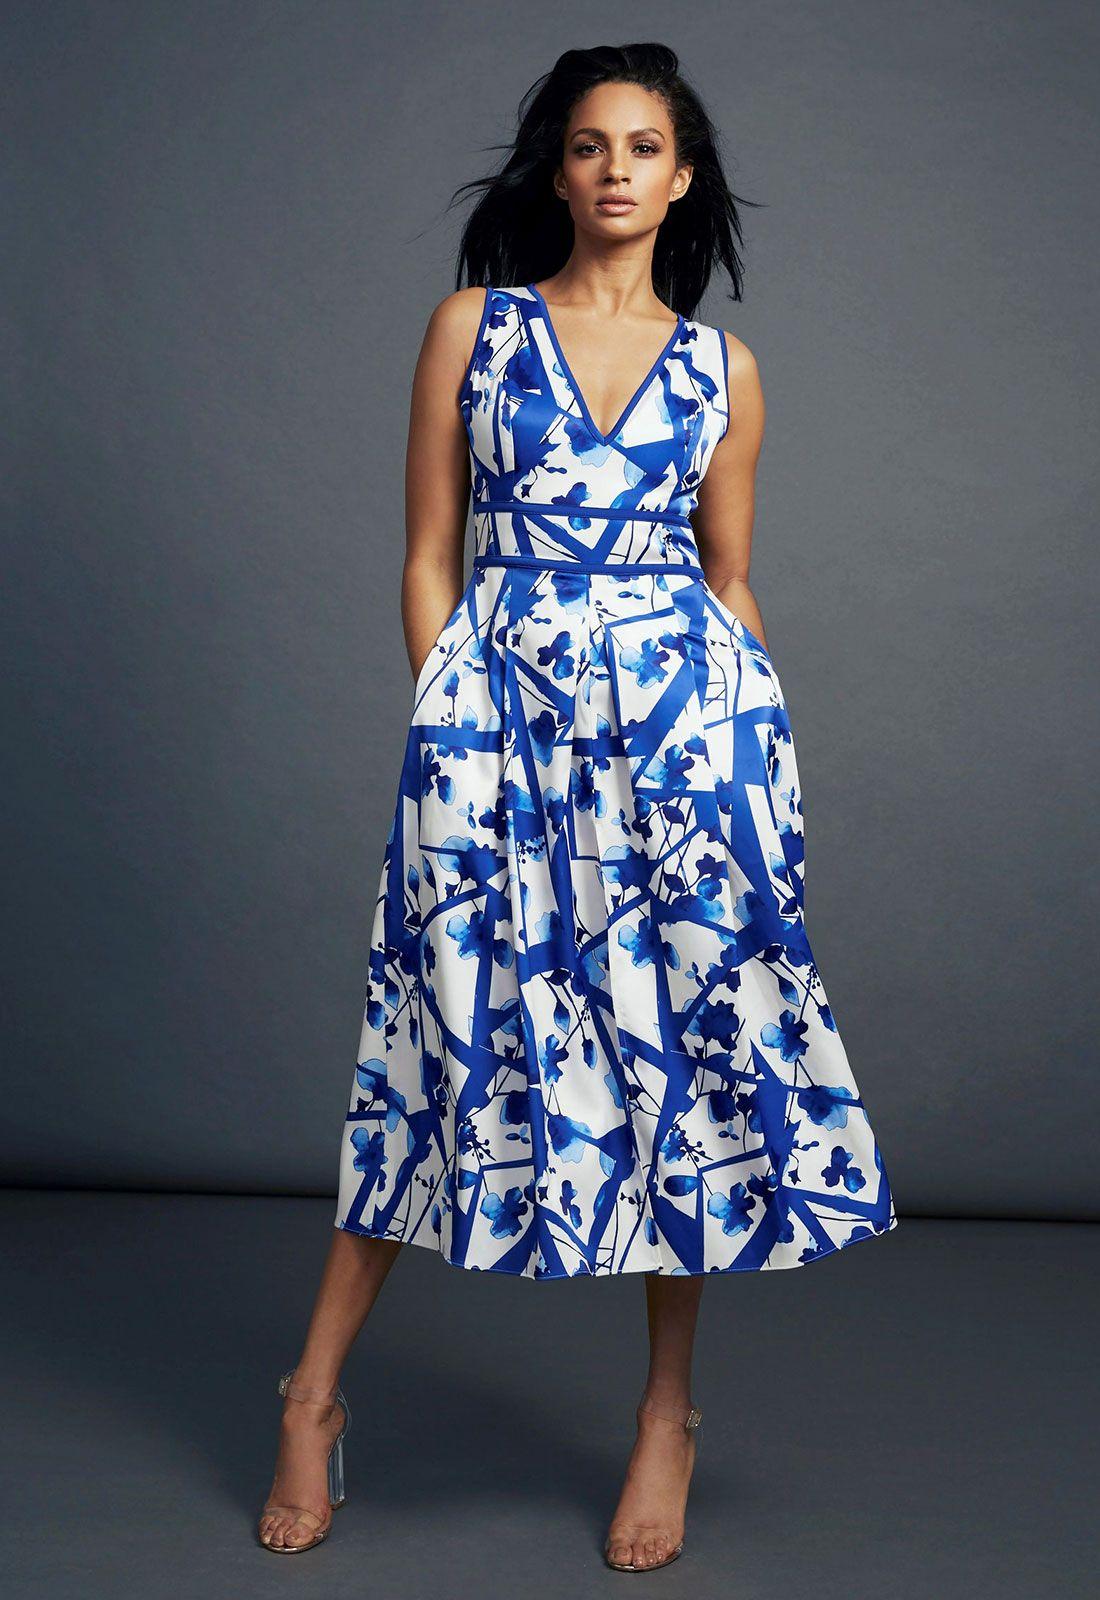 ALESHA DIXON Alesha Dixon Abstract Flower Print V-Neck Midi Dress in ...